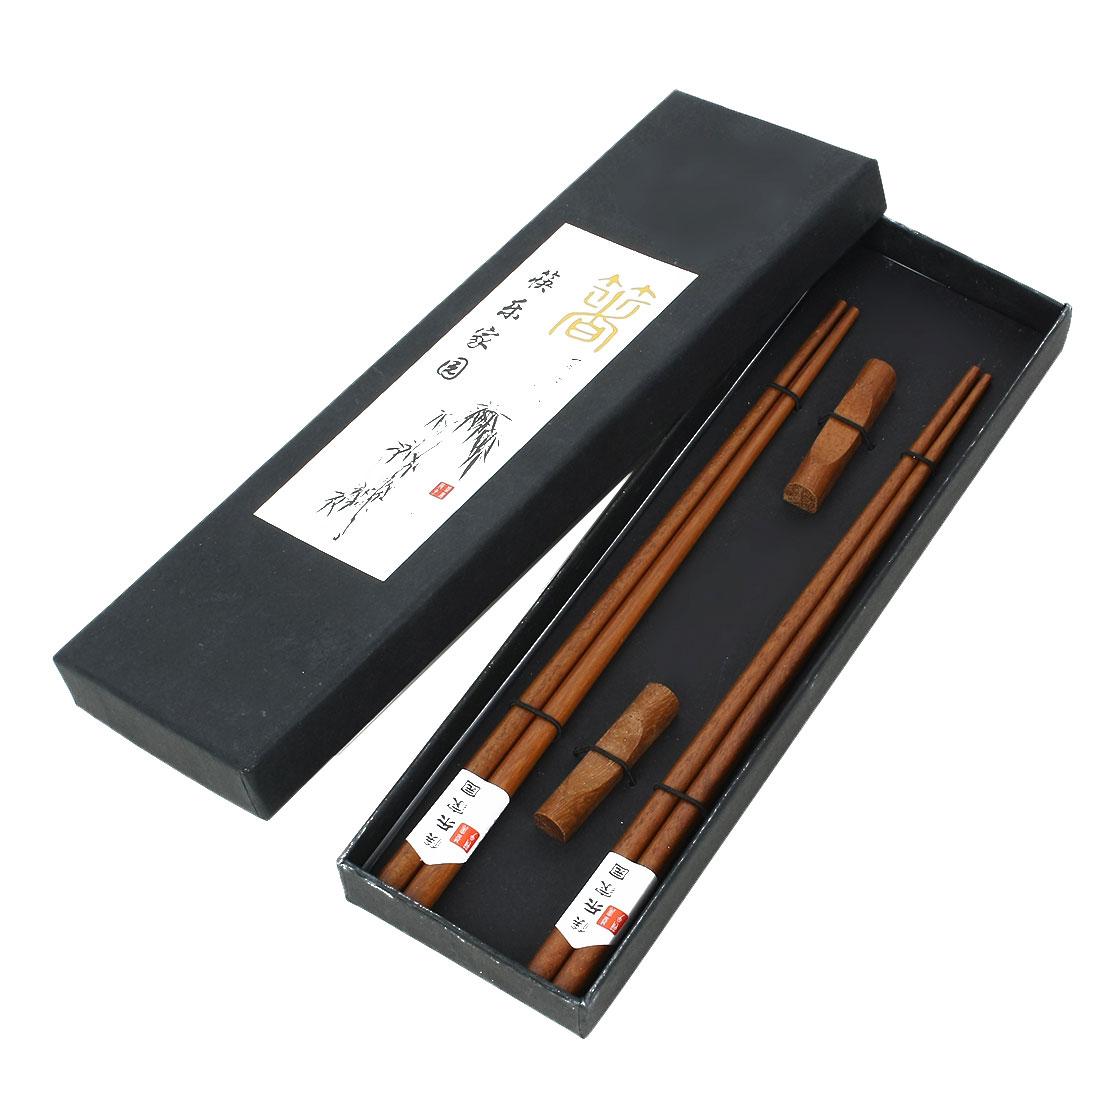 Casa-J Bamboo Traditional Chopsticks 2 Pairs Brown